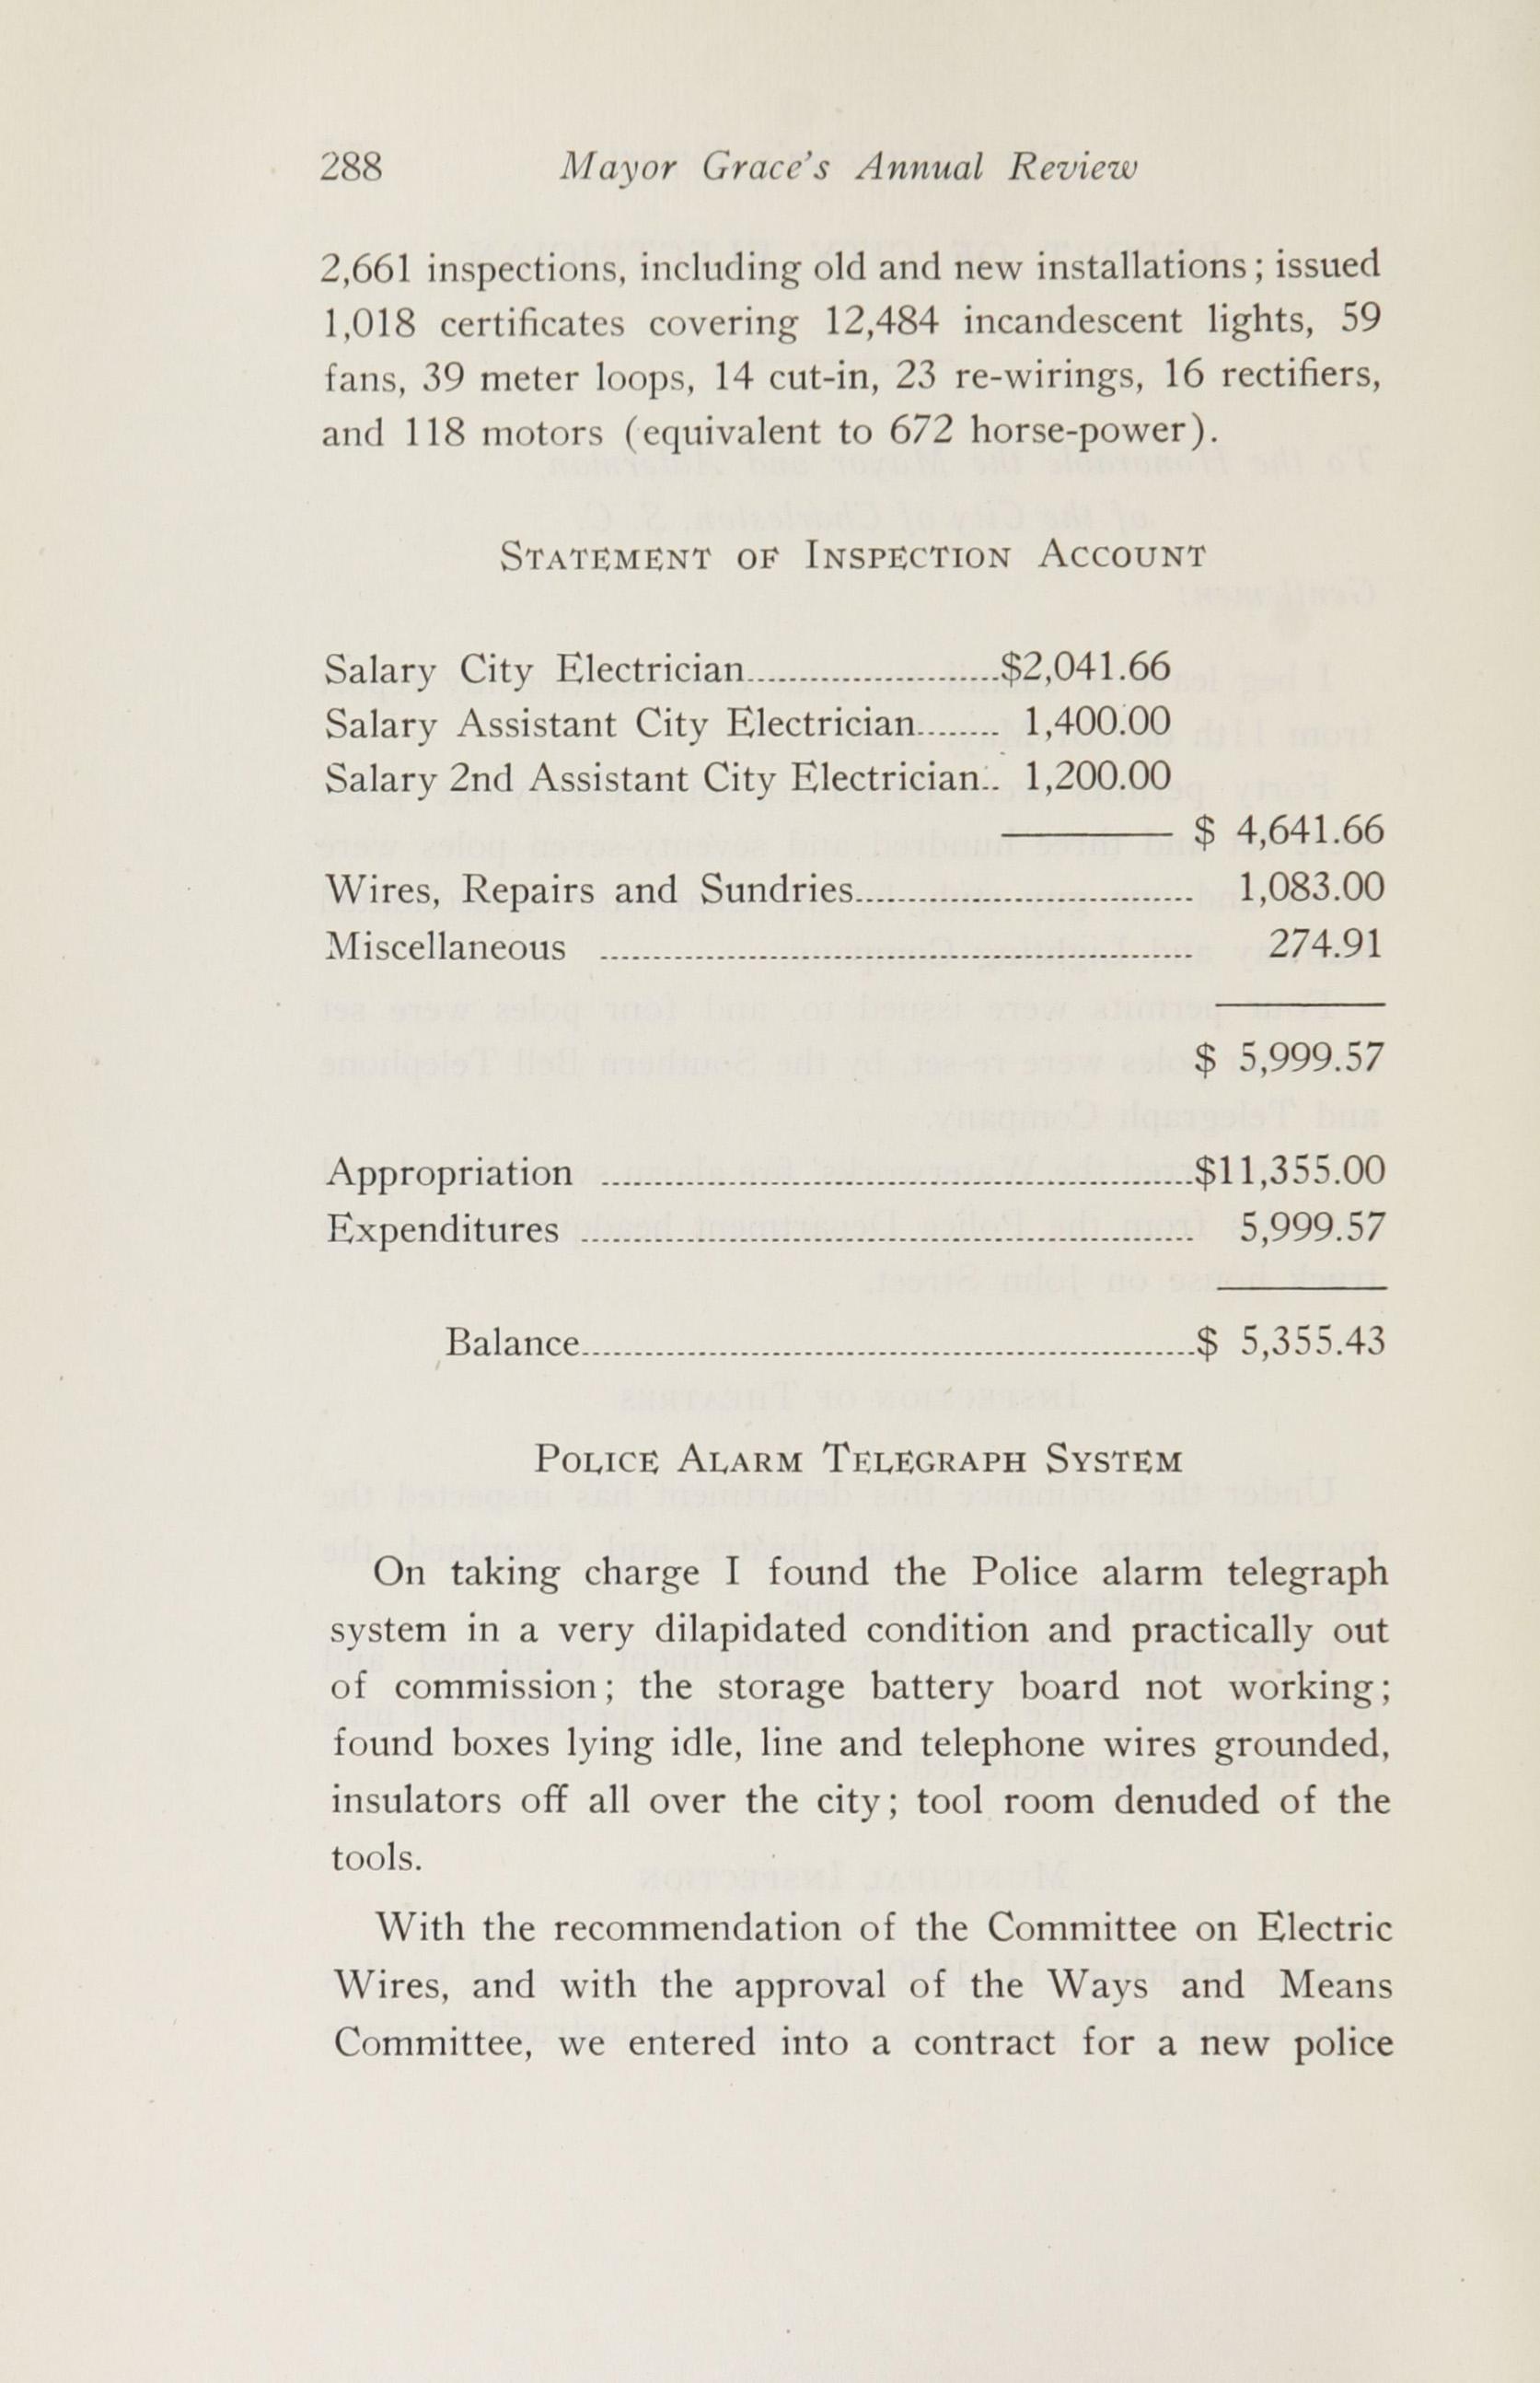 Charleston Yearbook, 1920, page 288